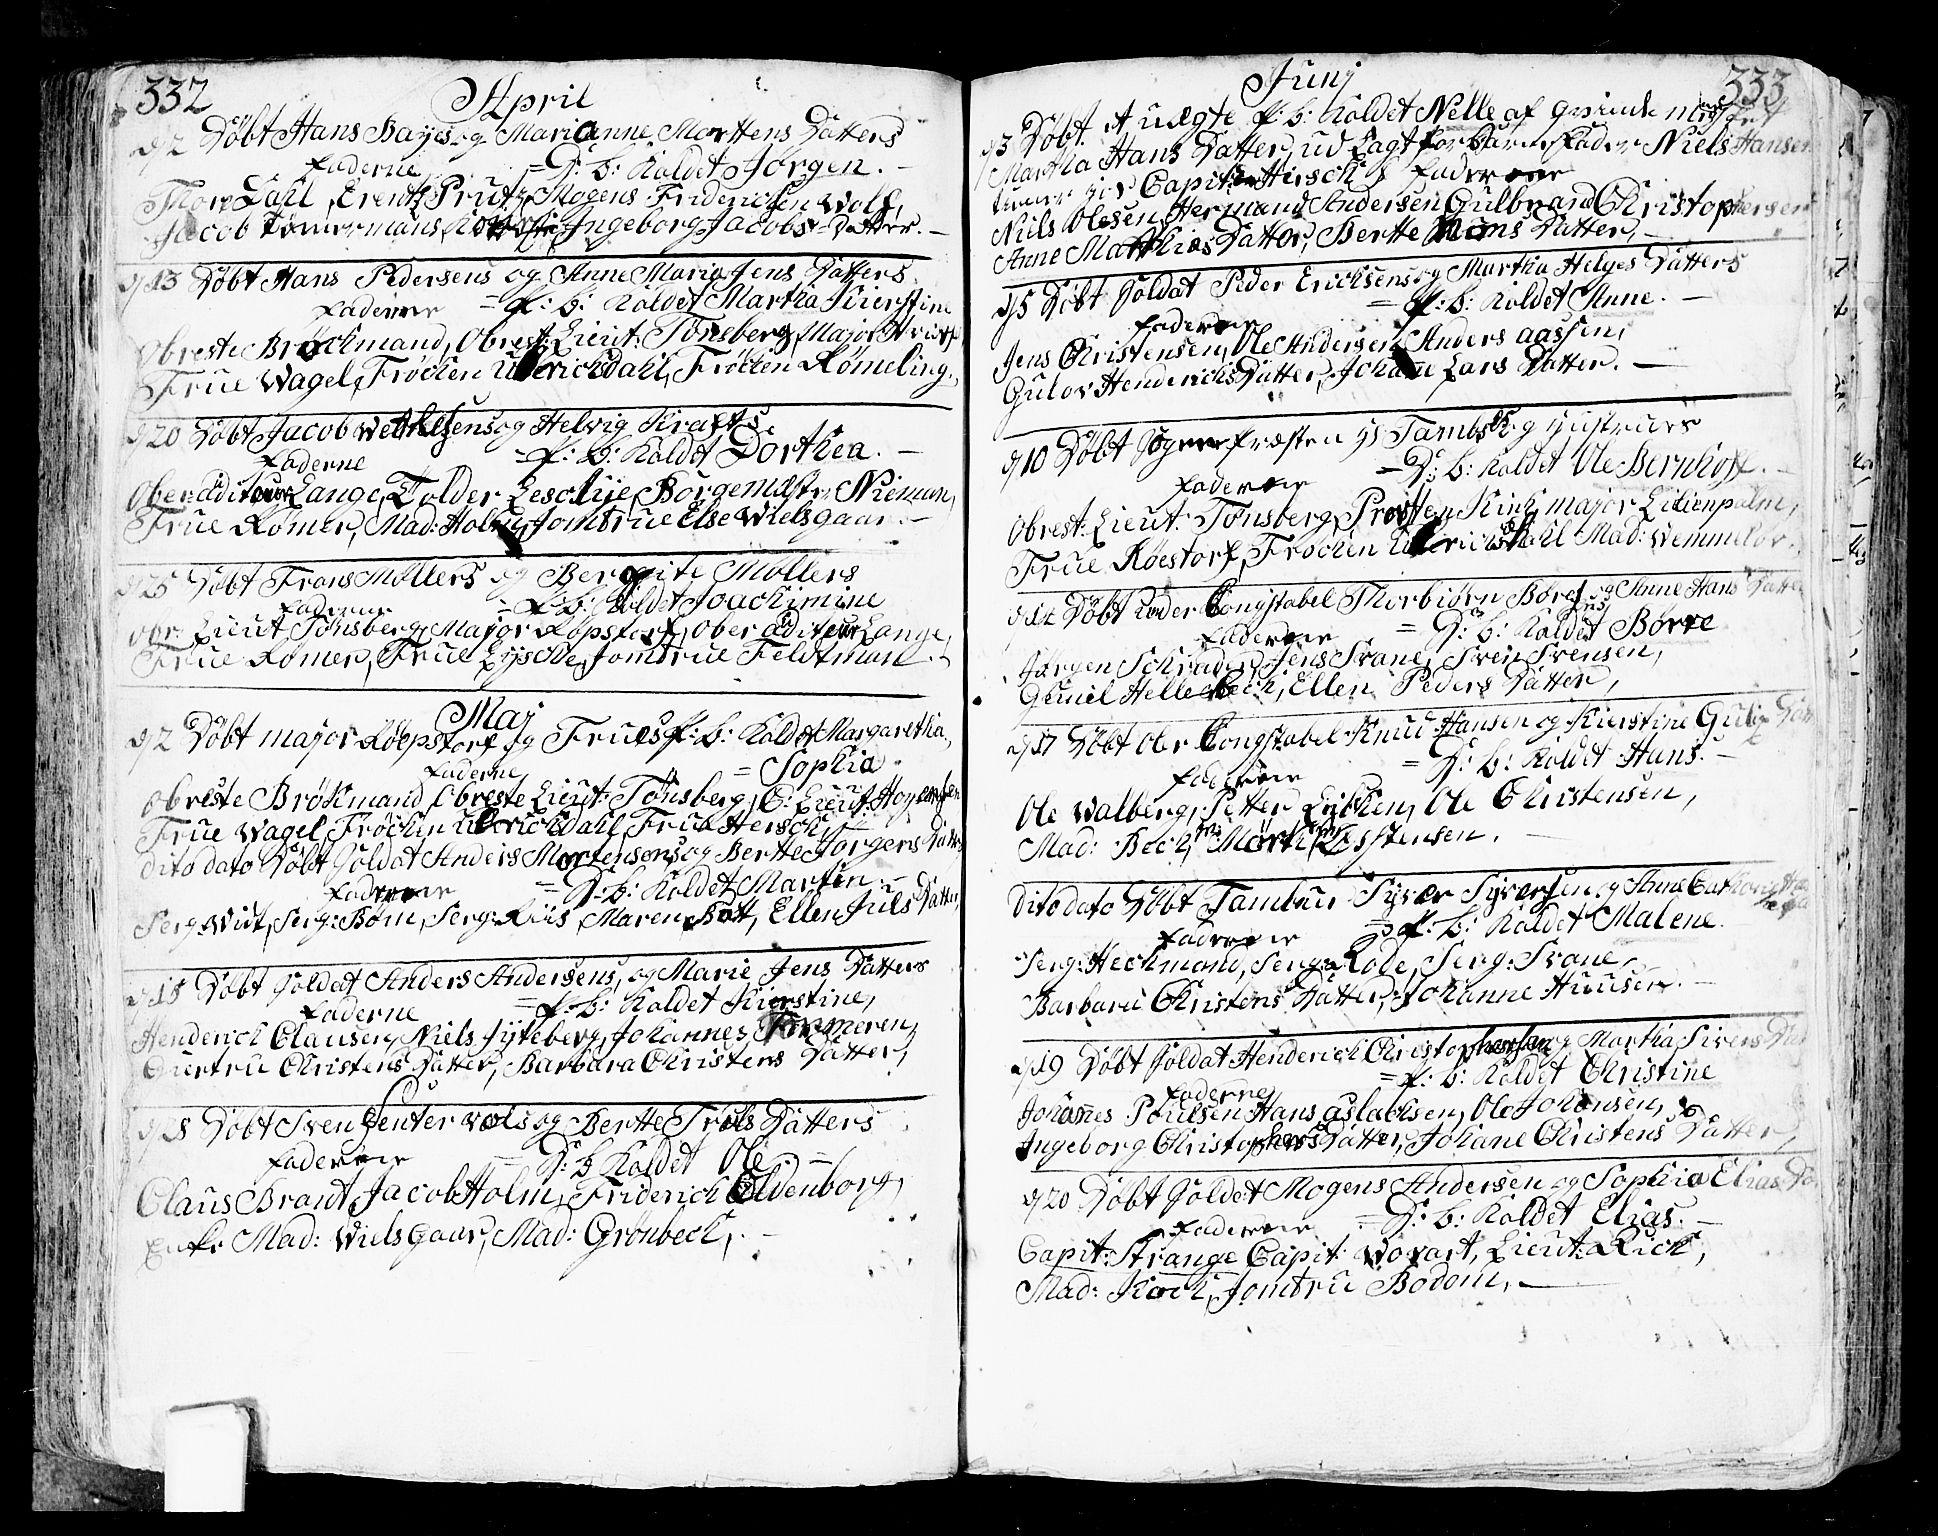 SAO, Fredrikstad prestekontor Kirkebøker, F/Fa/L0002: Ministerialbok nr. 2, 1750-1804, s. 332-333